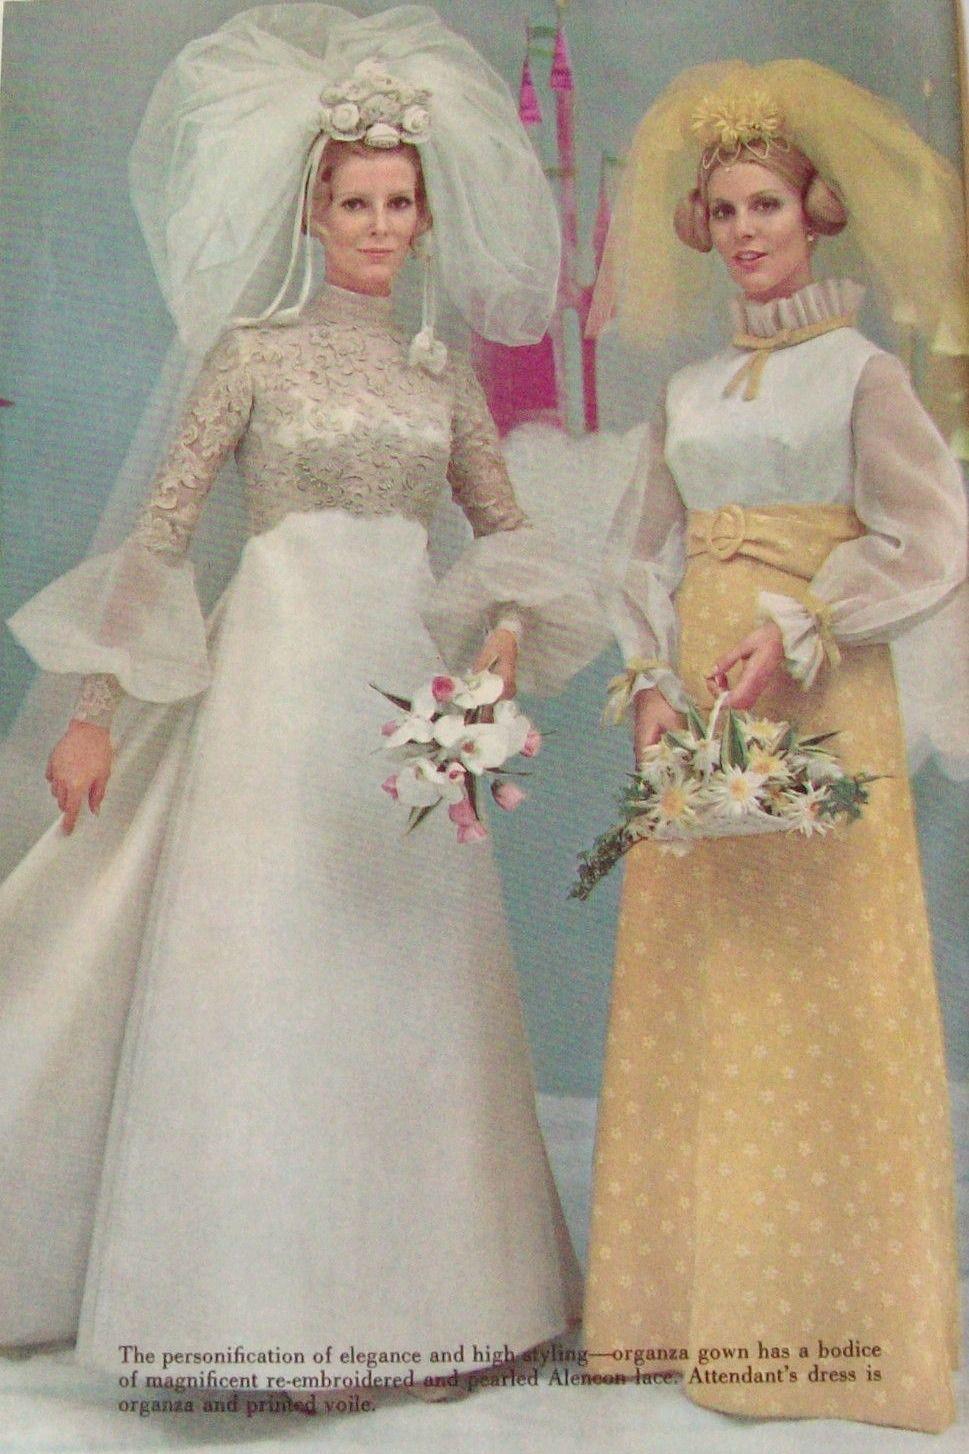 1970 Dresses for Elegant Party's